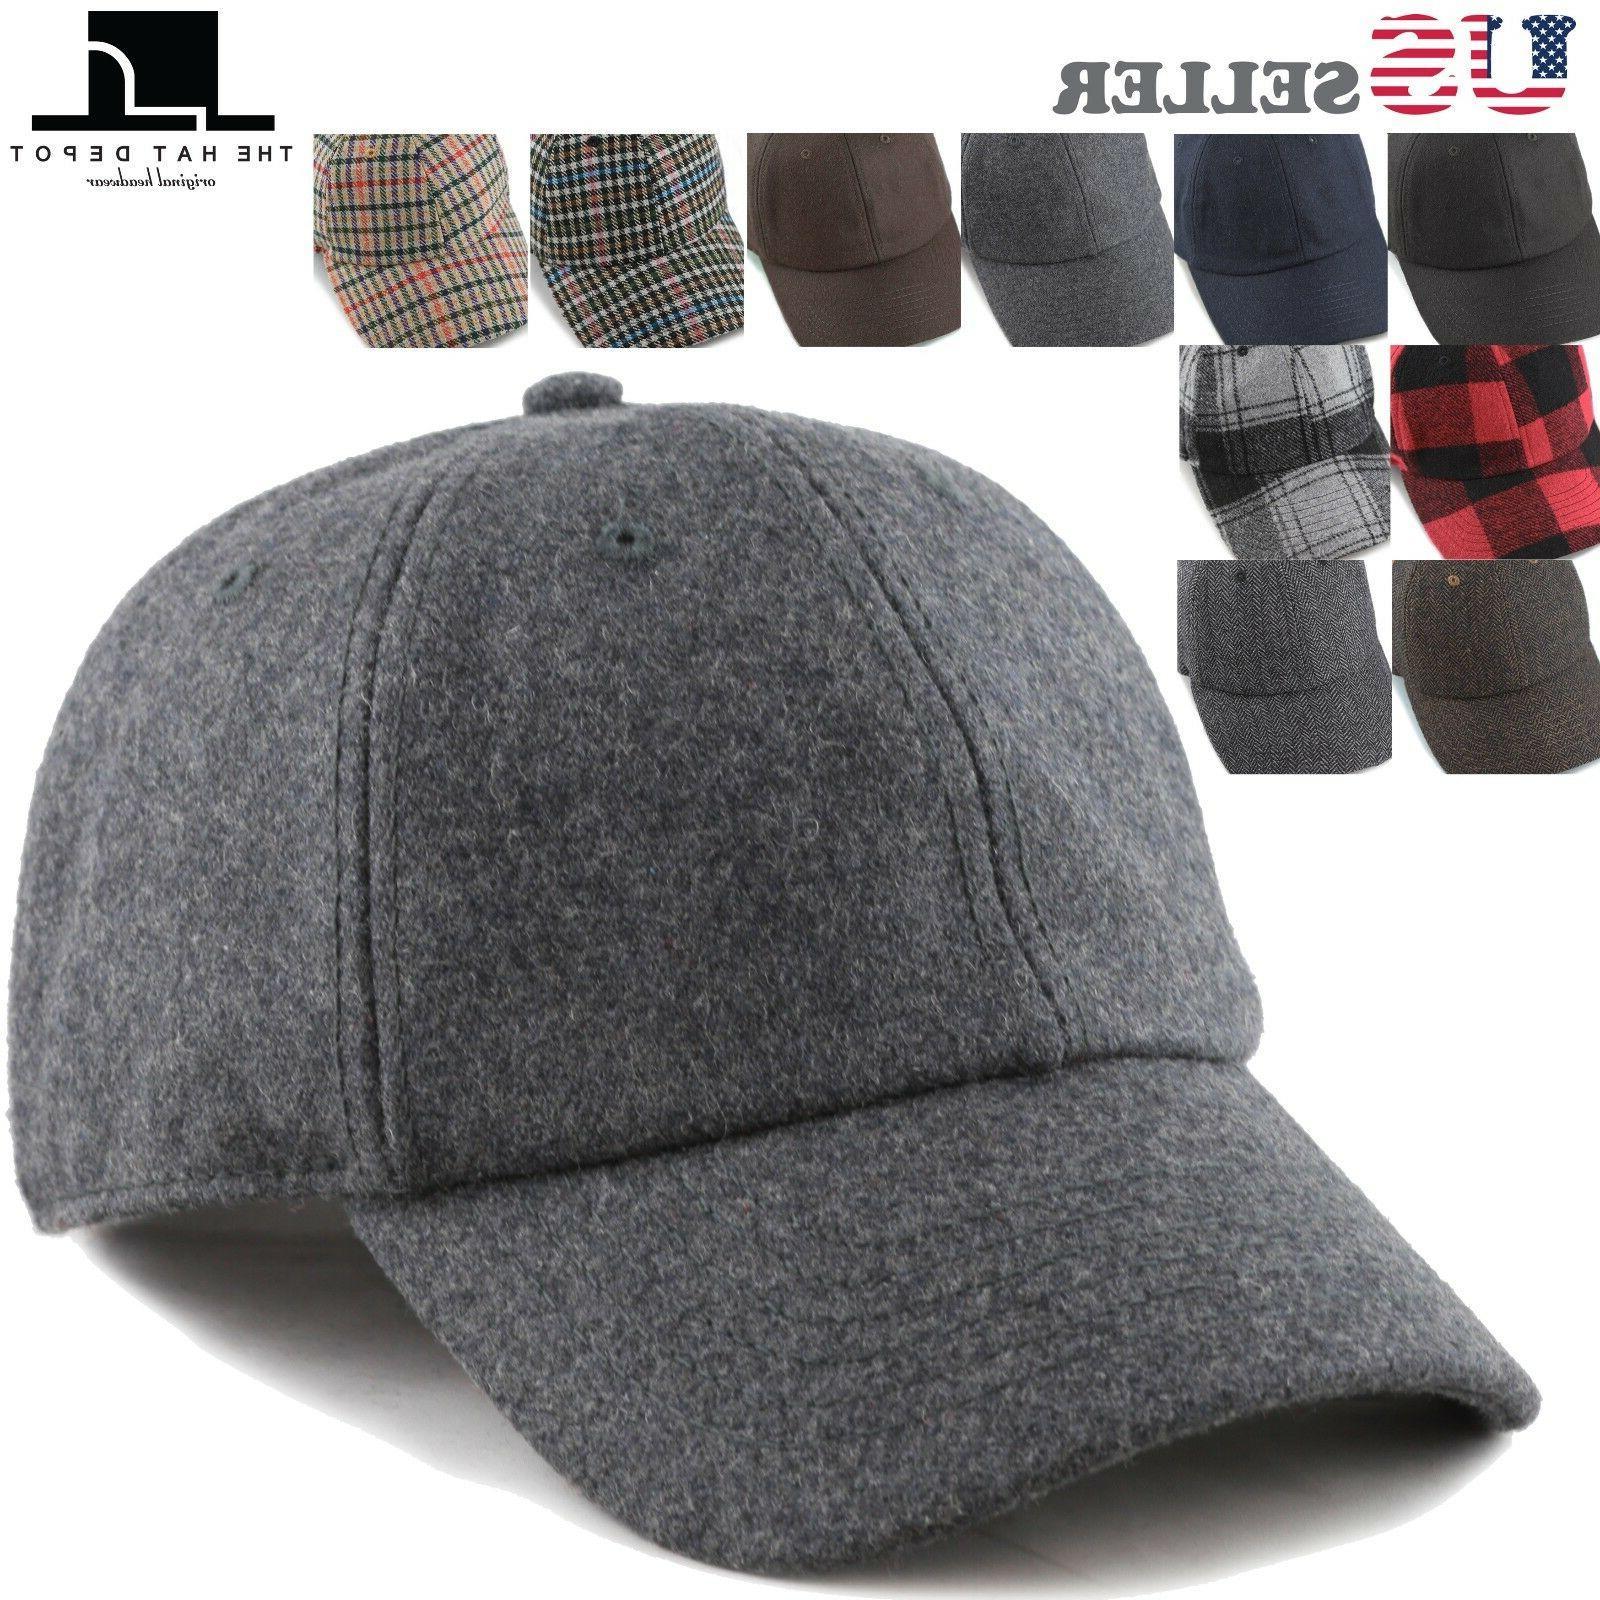 The Hat Depot Unisex Wool Blend Baseball Cap Hat with Adjust